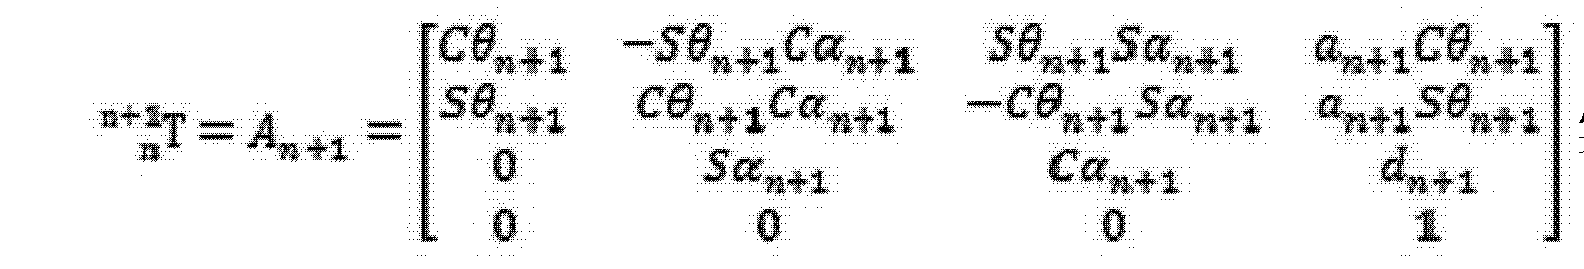 Figure CN104002307AD00053